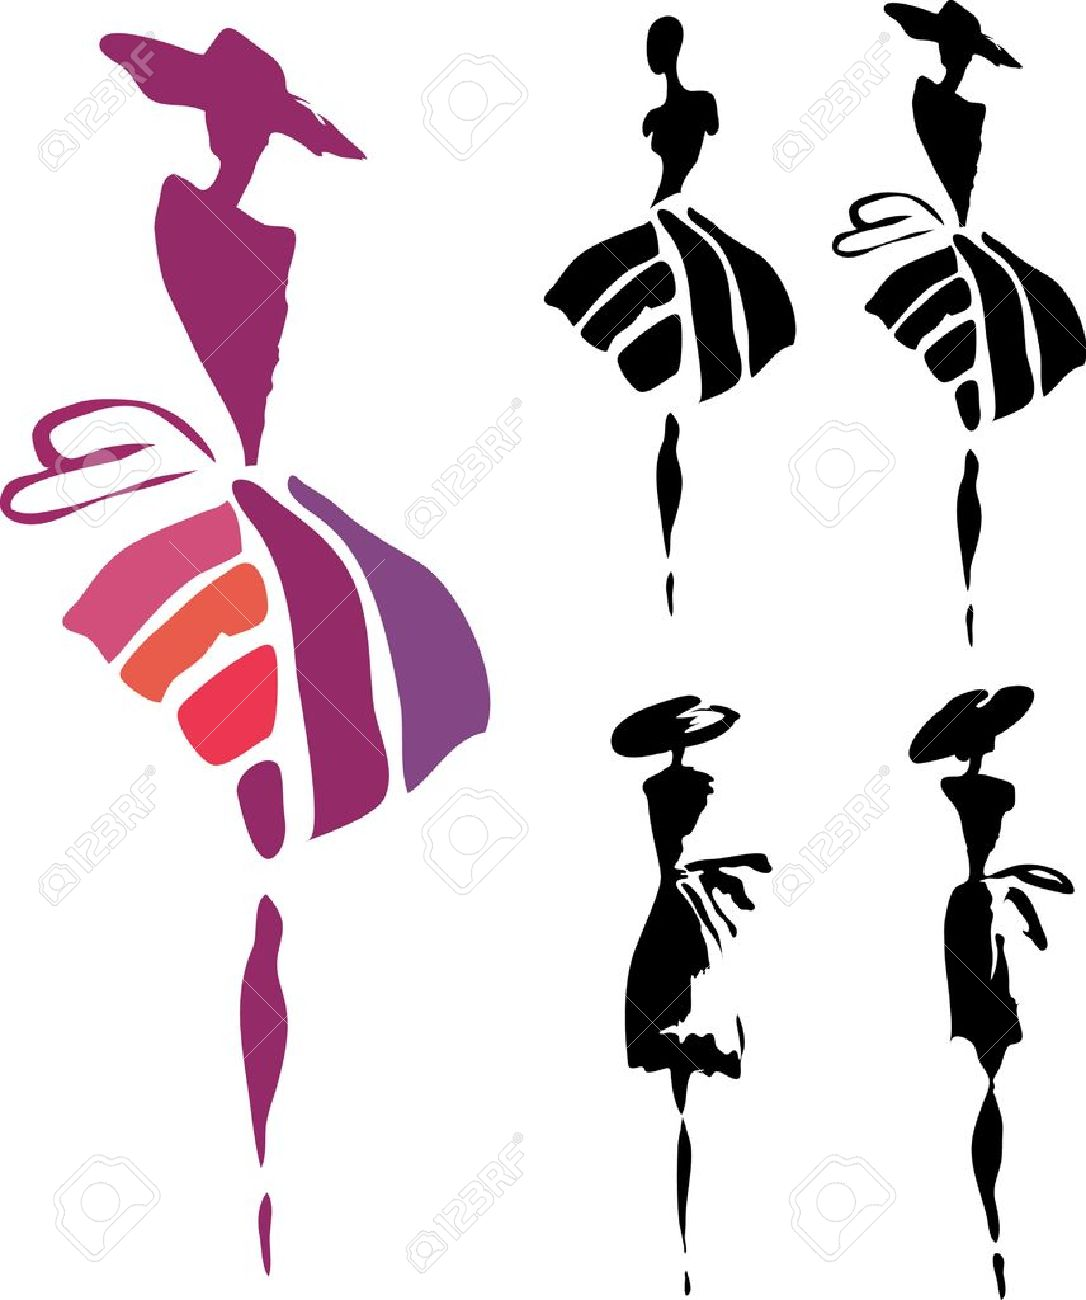 women silhouette Stock Vector - 18356204